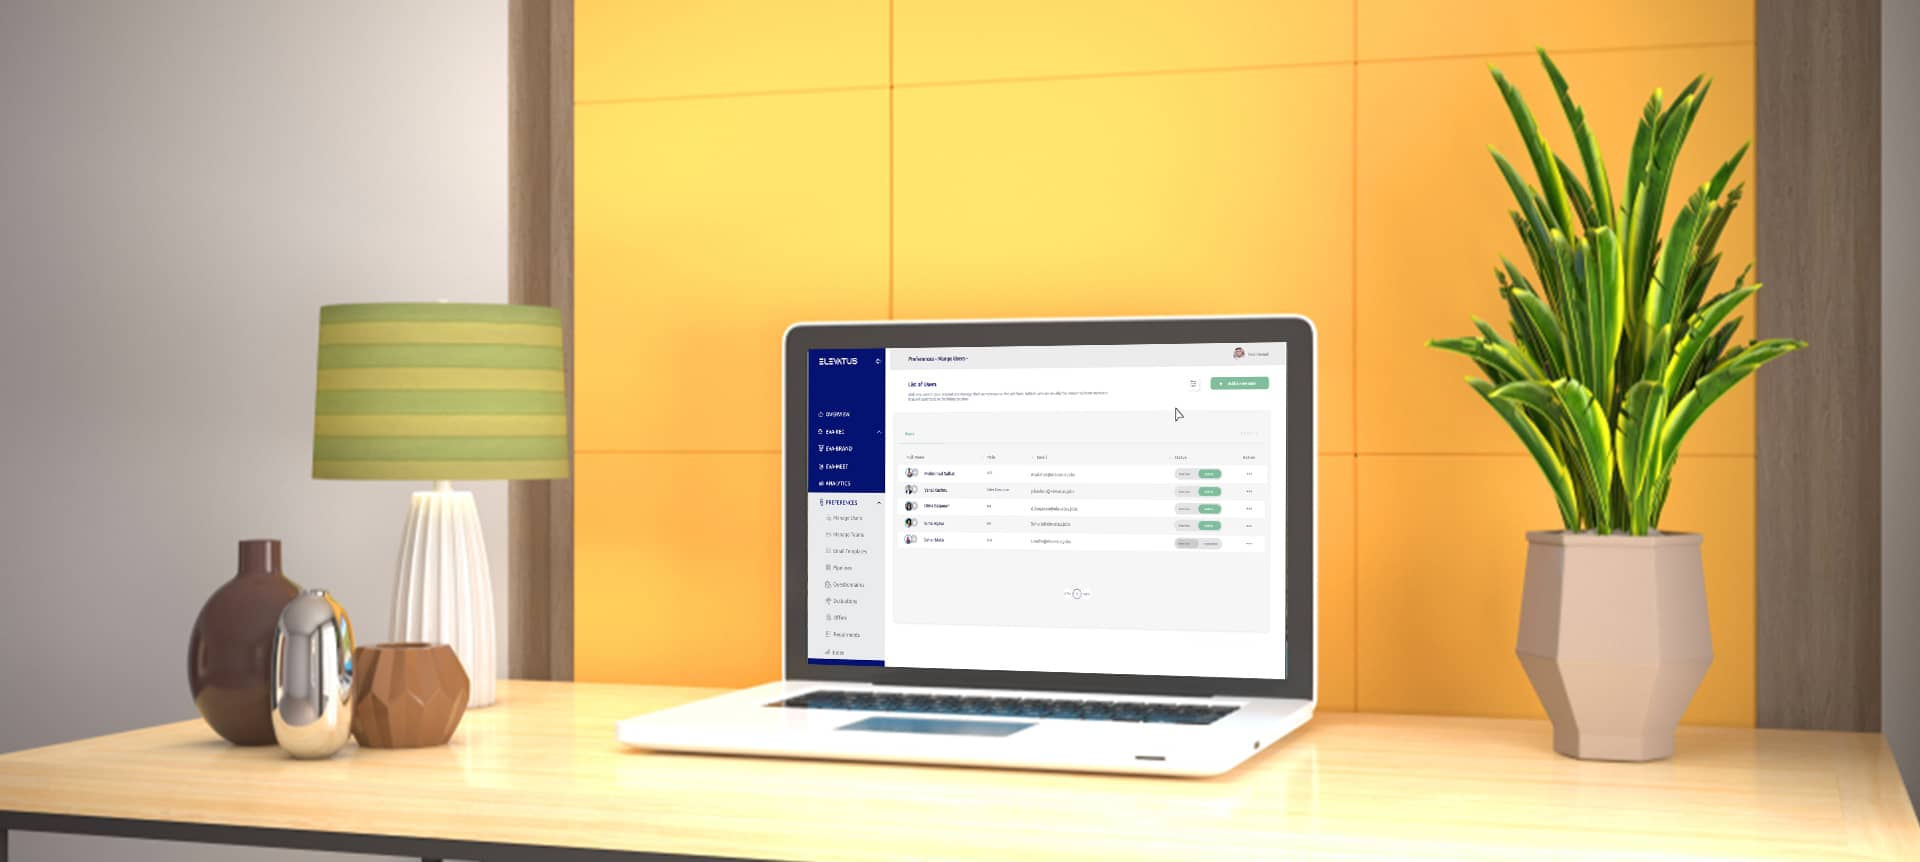 laptop showing remote talent acquisition software